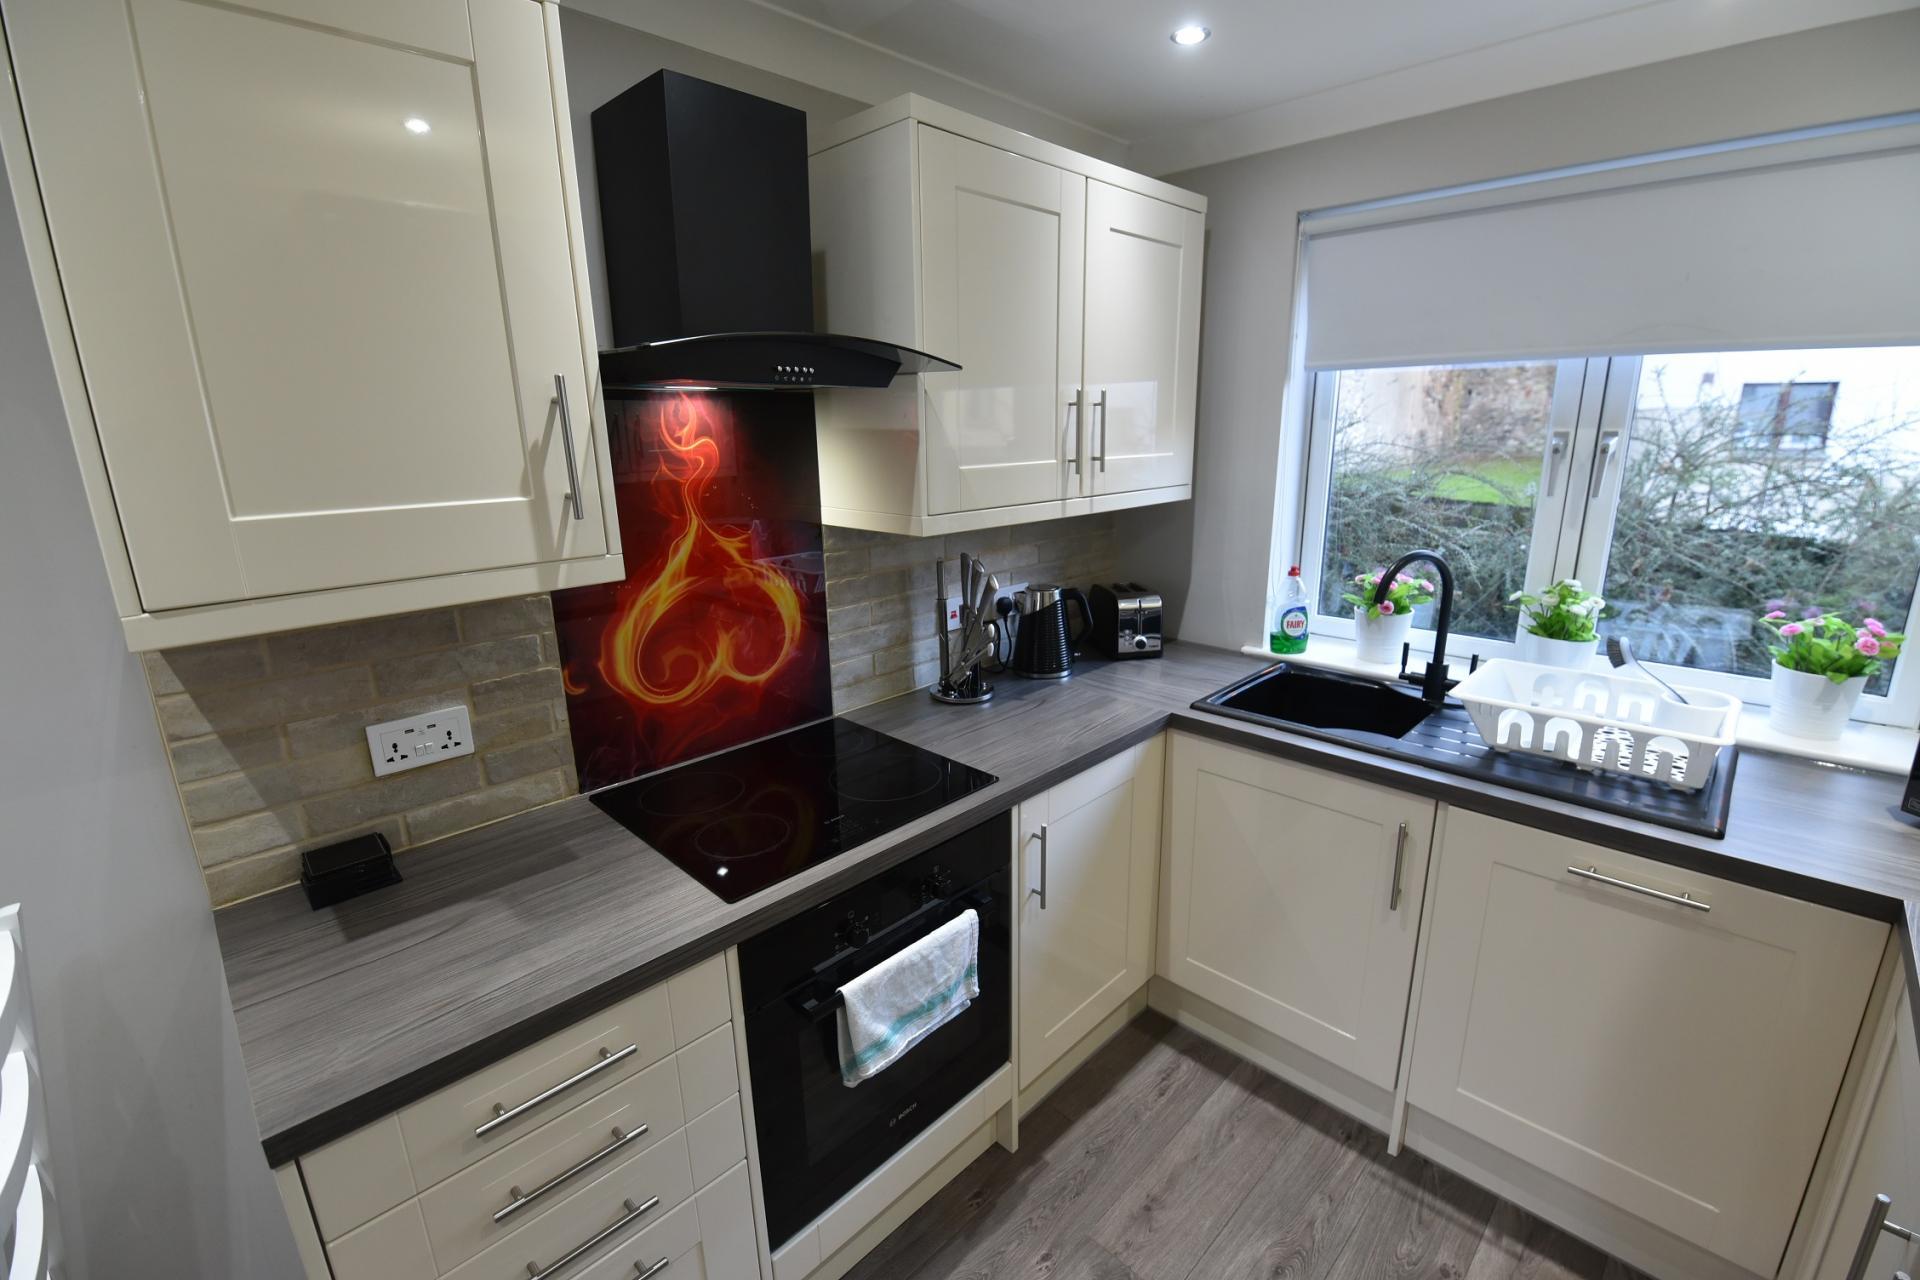 Kitchen at St Johns Hill Apartment, Old Town, Edinburgh - Citybase Apartments